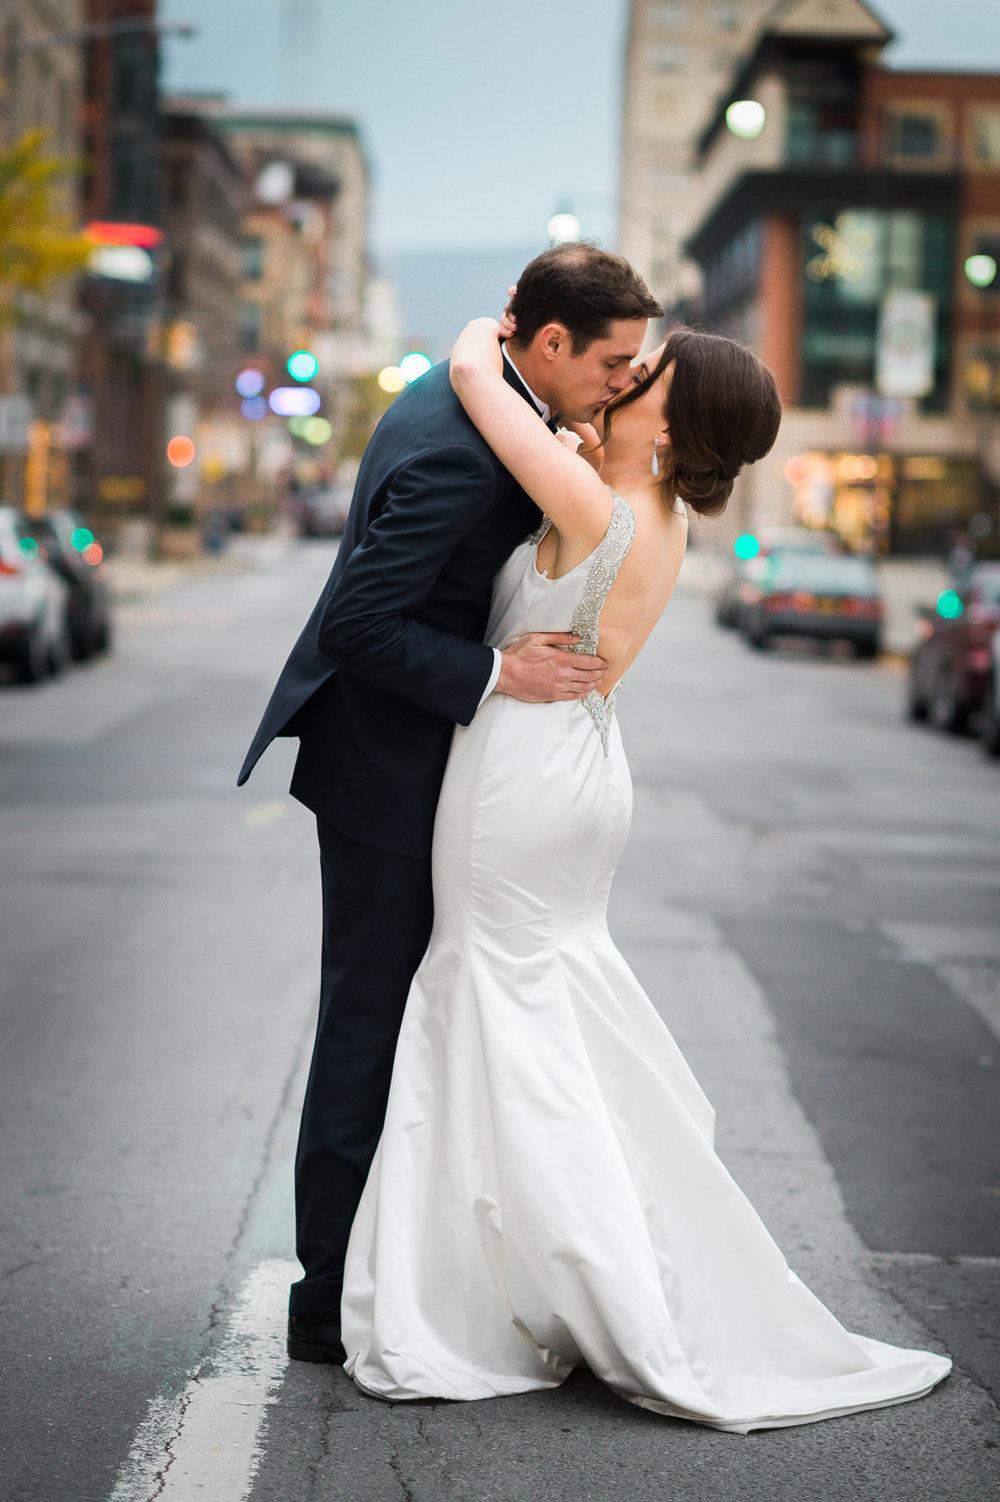 scranton-hilton-wedding-photographer-steven-serge-northeast-pa--51.jpg